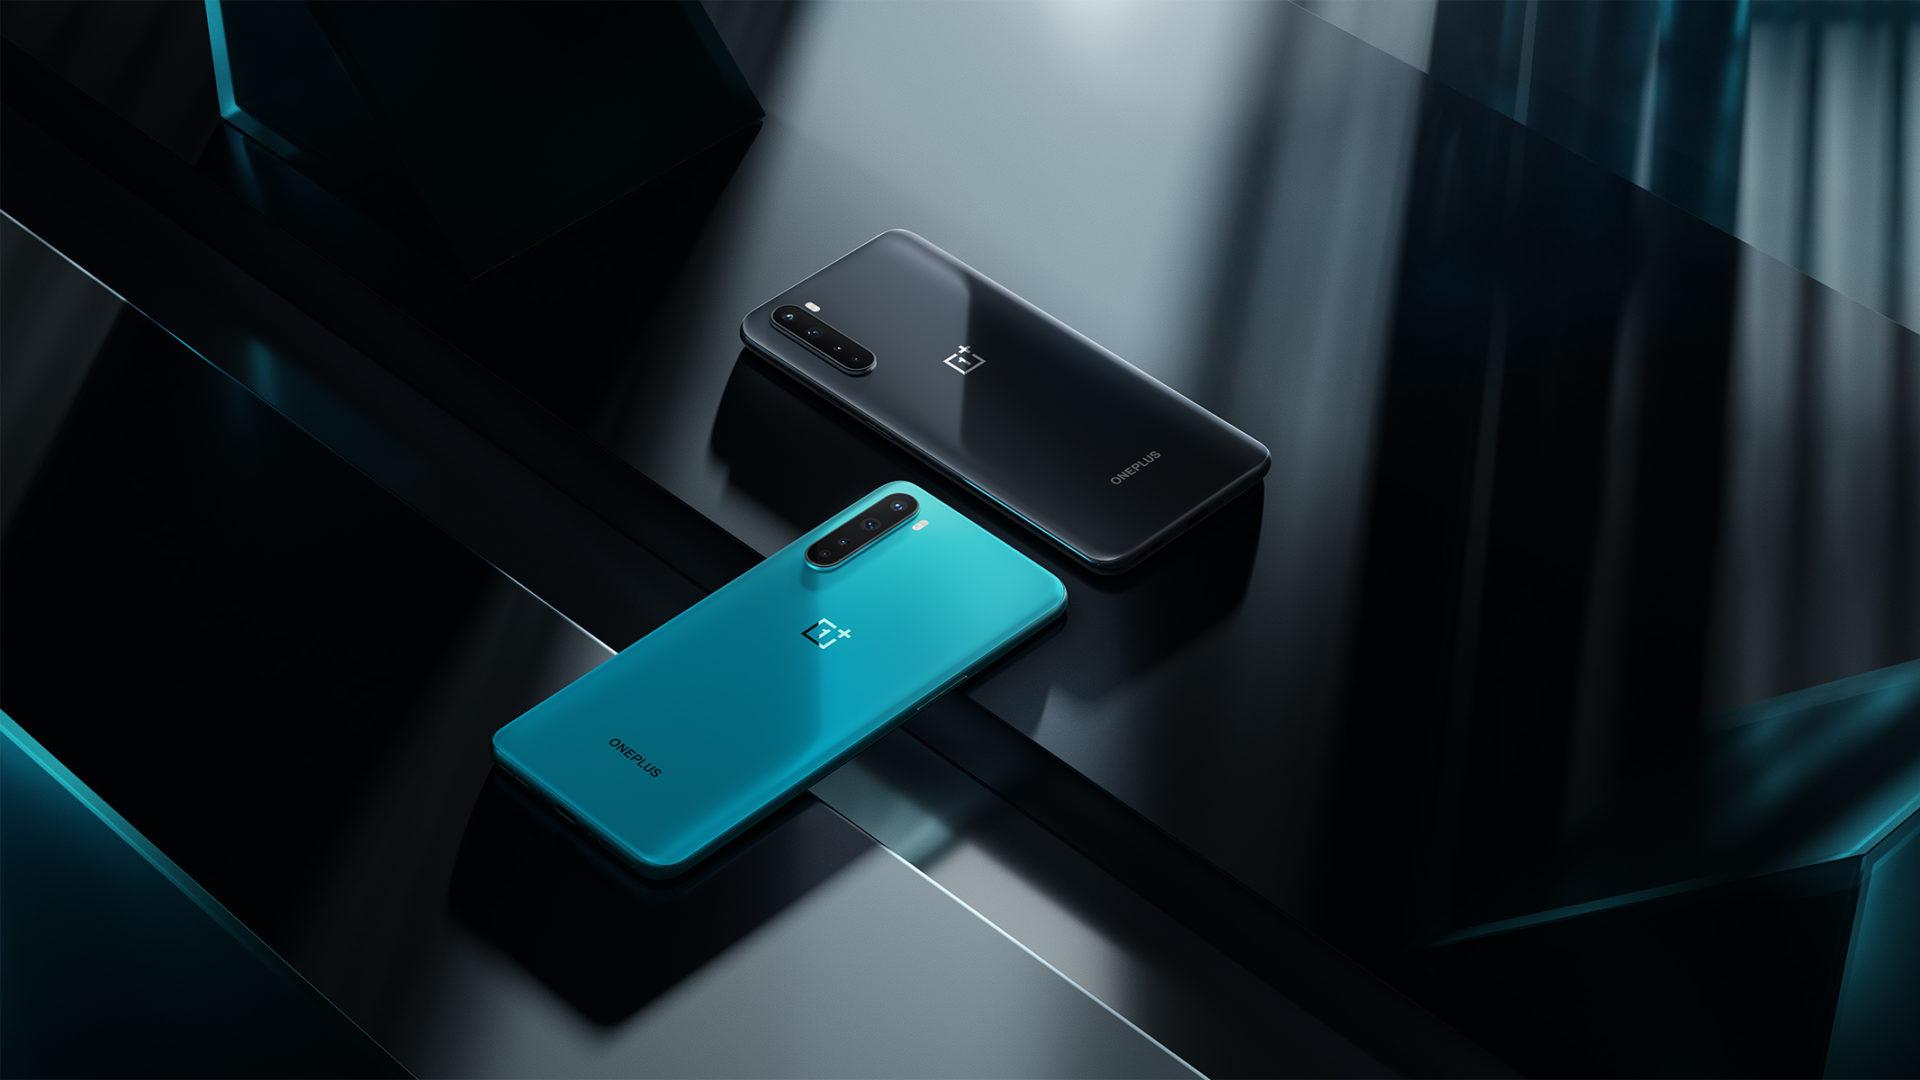 「Snapdragon 690」を搭載するスマホ「OnePlus Nord N10 5G」の詳細がリーク